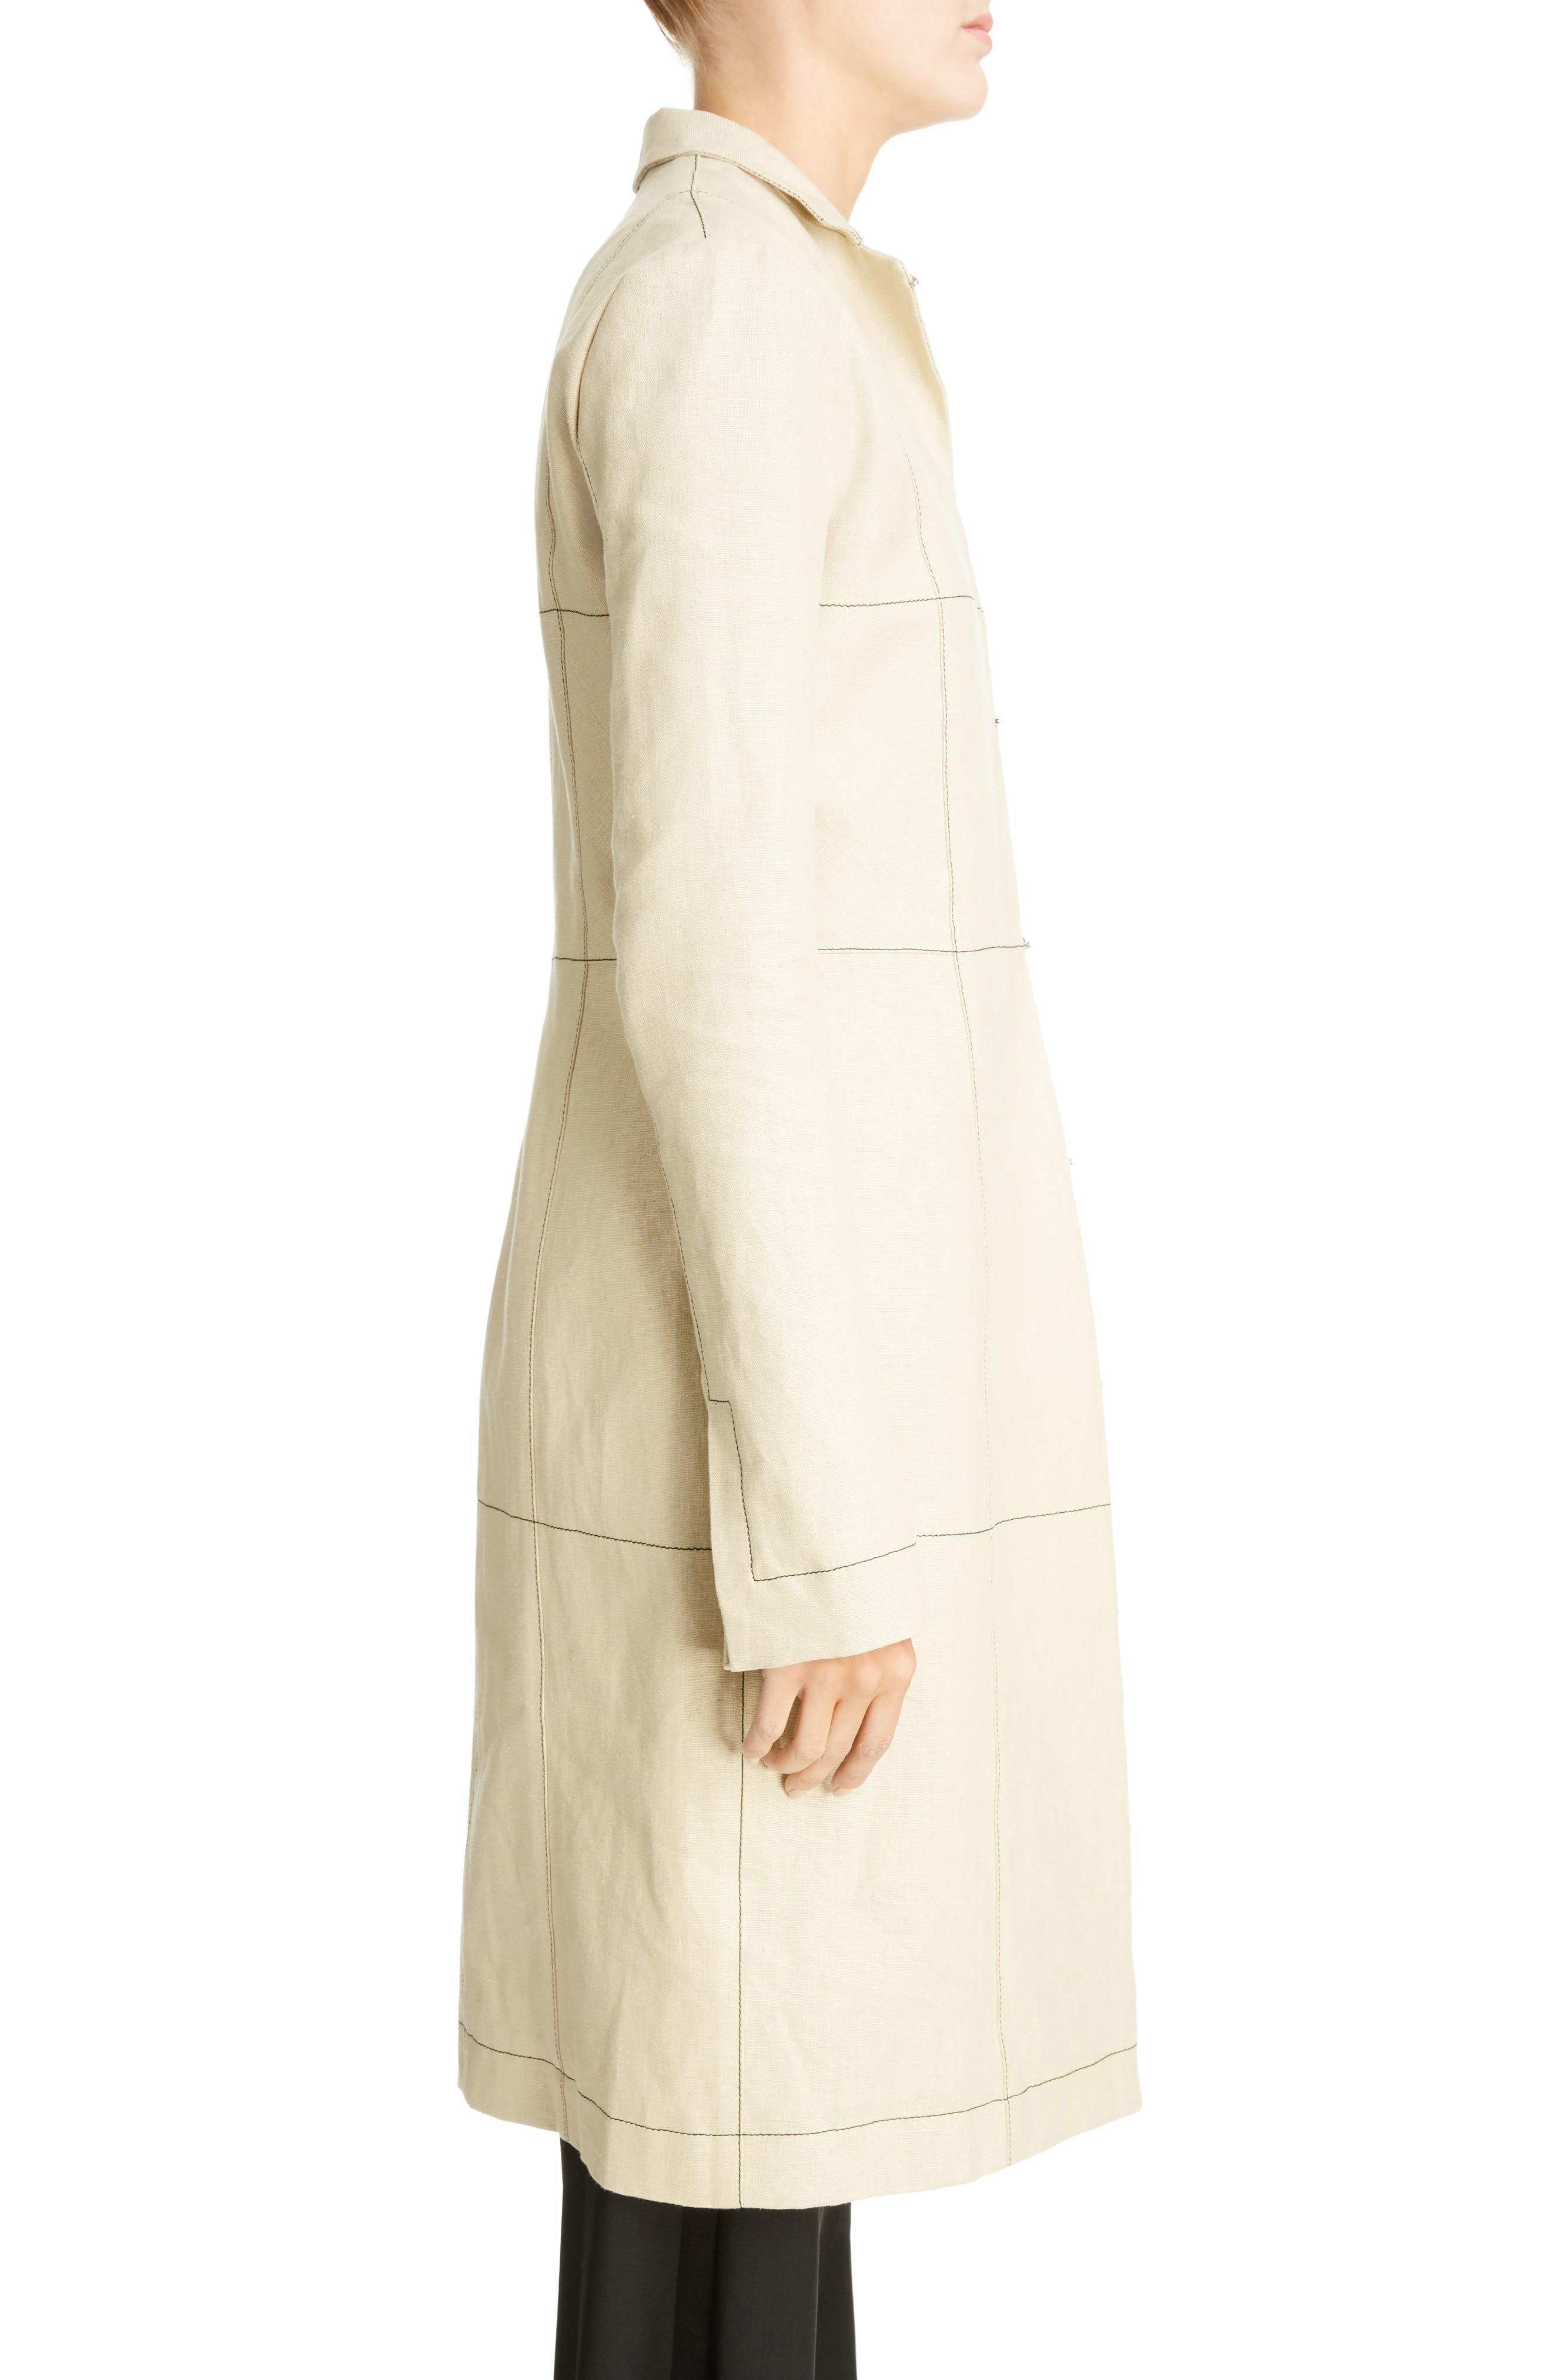 Topstitched Linen Coat,                             Alternate thumbnail 3, color,                             273